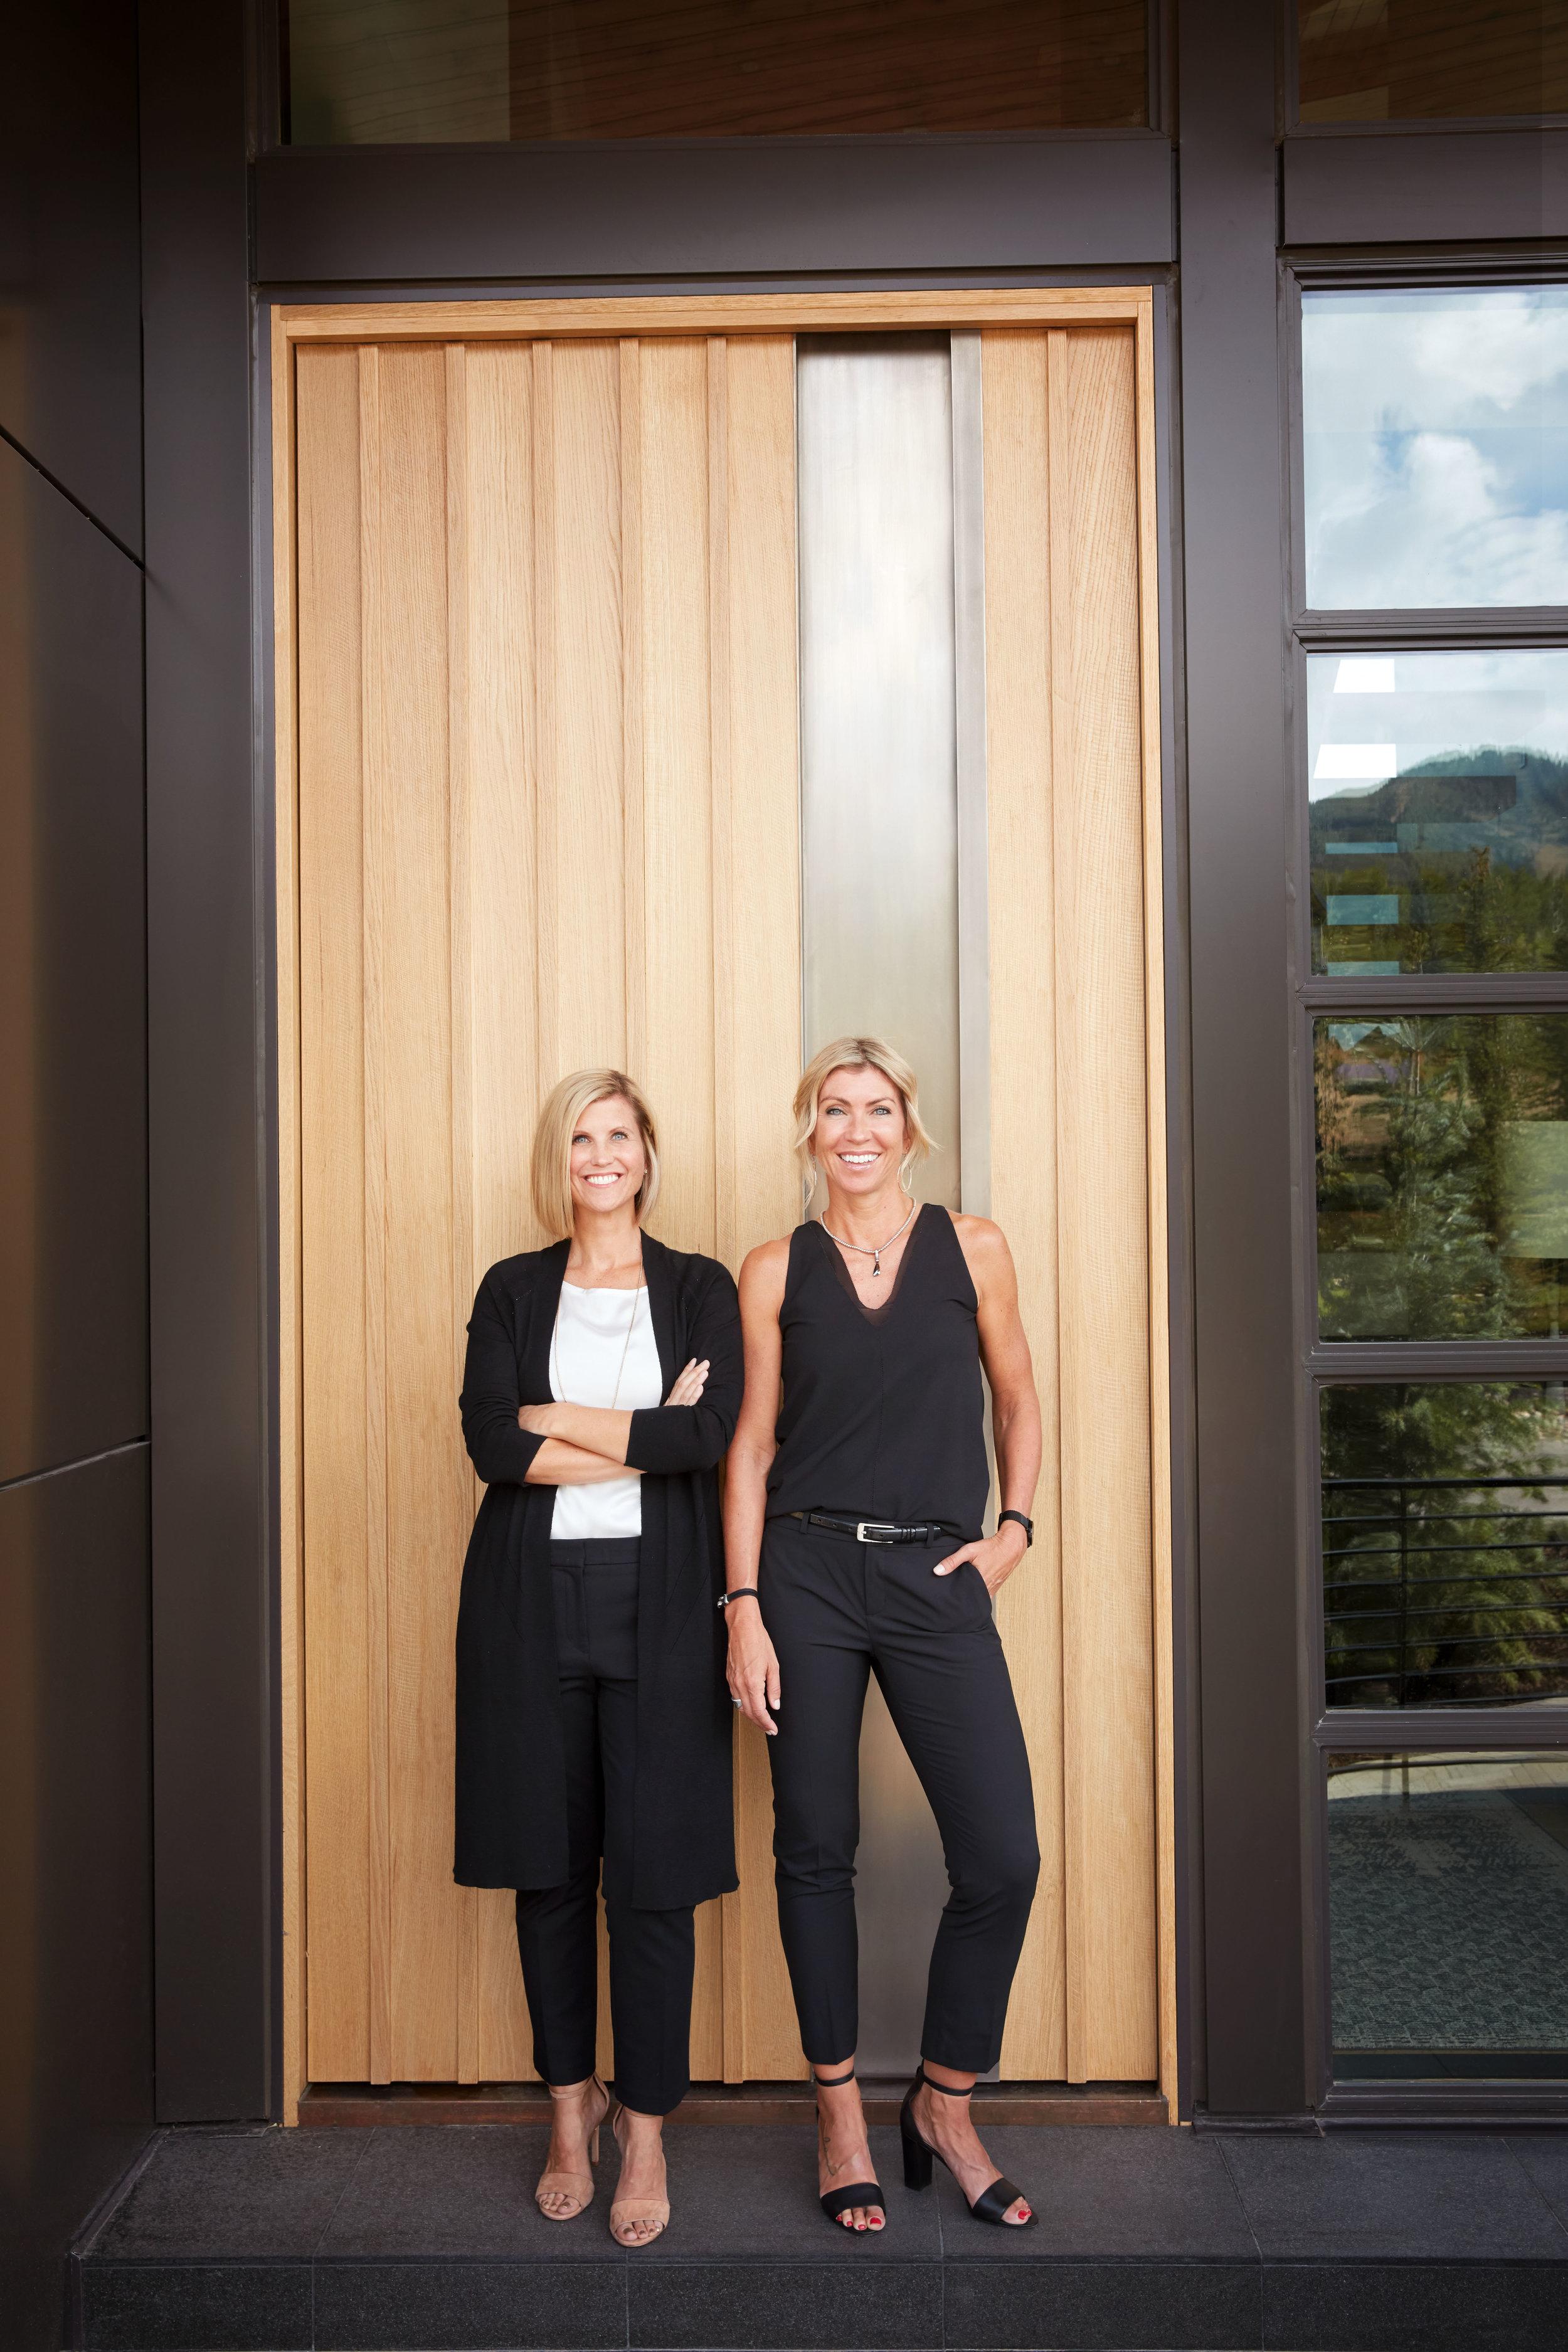 Lecate-Design-Artisan-Door-Finishes-Custom-Door-Sidelights-Wood-Glass-Leslie-Schofield-Catherine-Goodsell.png